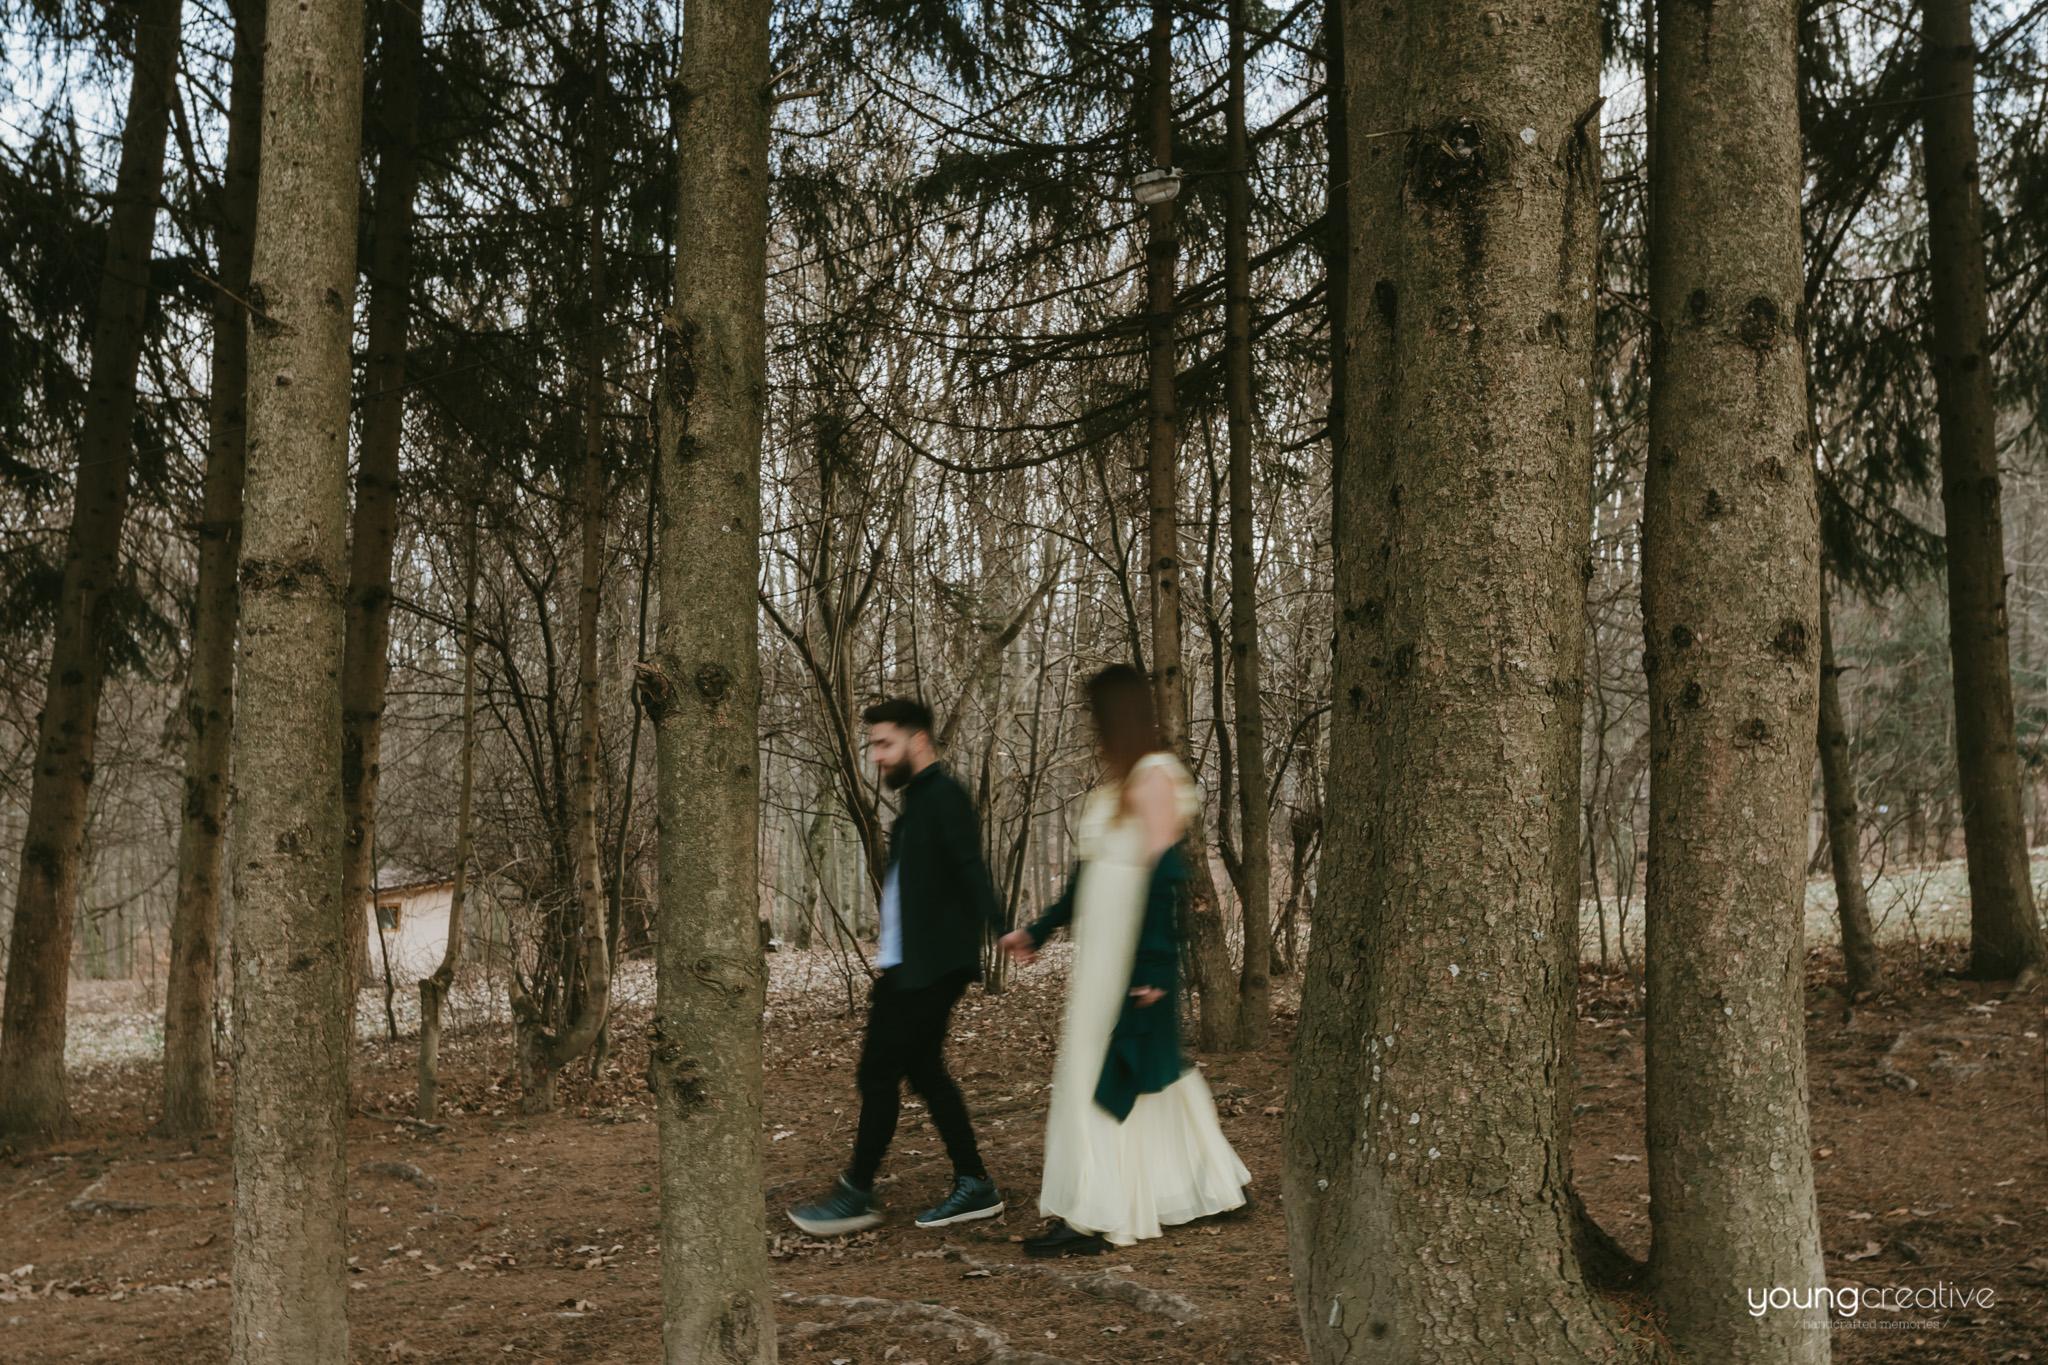 Mirela & Laurentiu | youngcreative.info media © Cristina Bejan, Dan Filipciuc | fotograf nunta Iasi